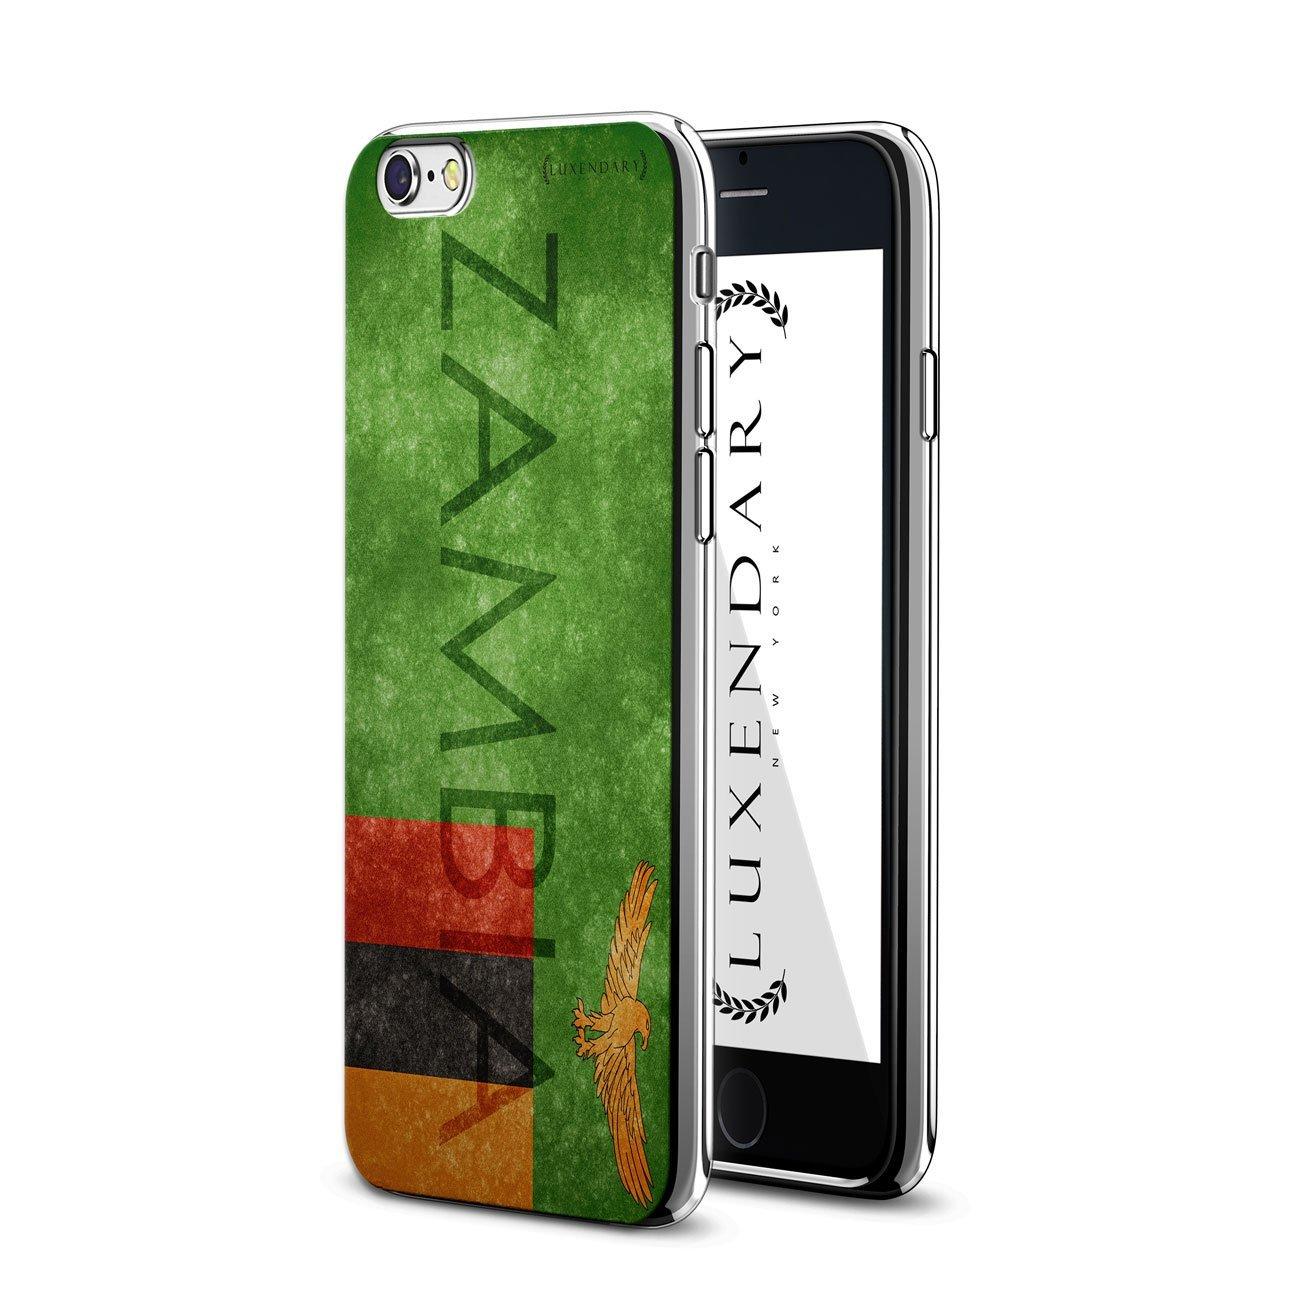 iPhone 6 / 6S Plus用Luxendary LUX-I6PLCRM-ZAMBIA1ザンビアフラッグデザインクロームシリーズケース   B01N2X2DDG